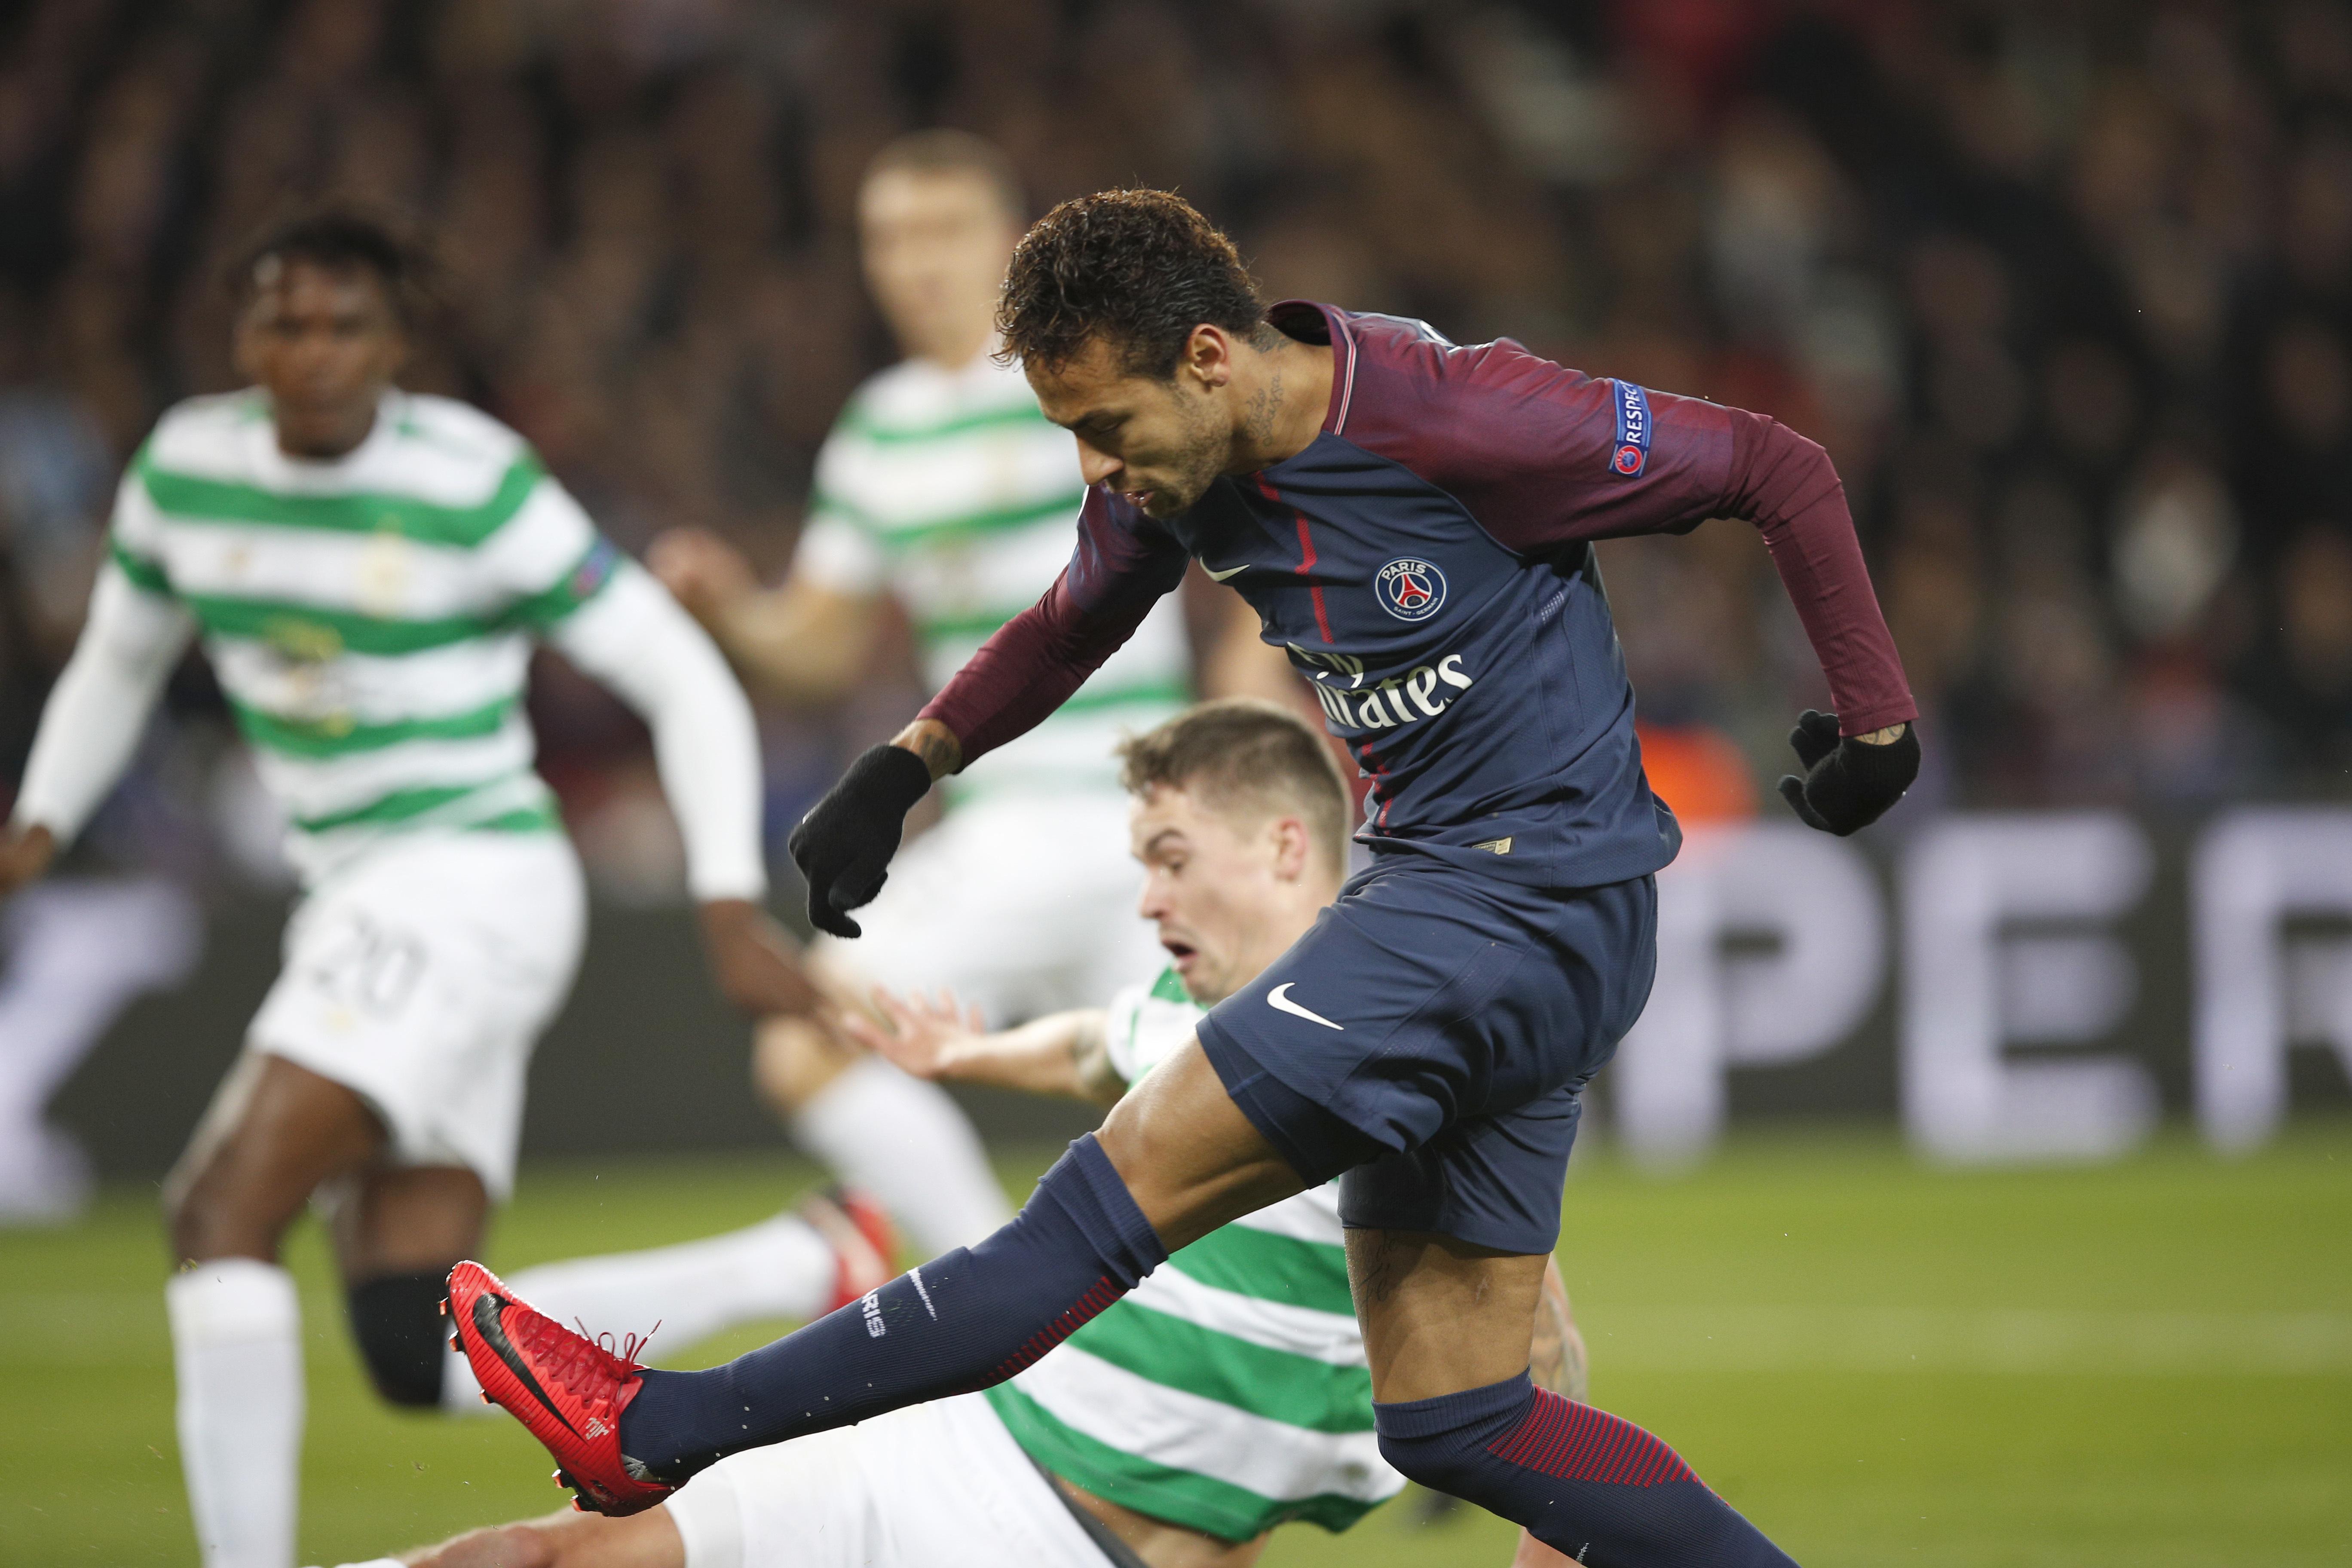 France_soccer_champions_league_42433